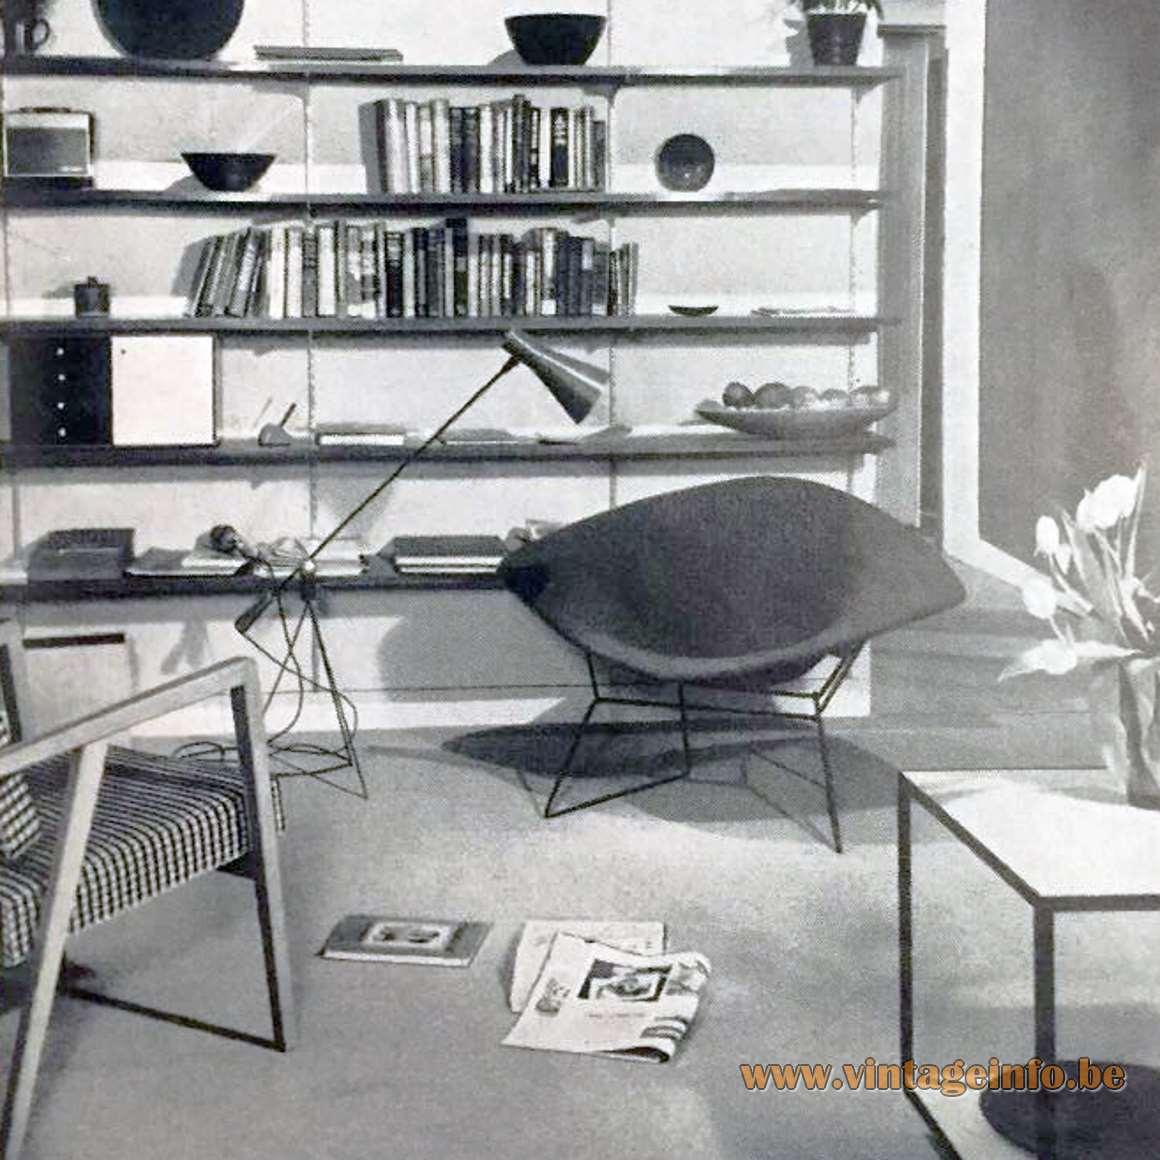 Magneto Floor Lamp 1950 design by Gilbert Allen 'Gil' Watrousproduced by Heifetz